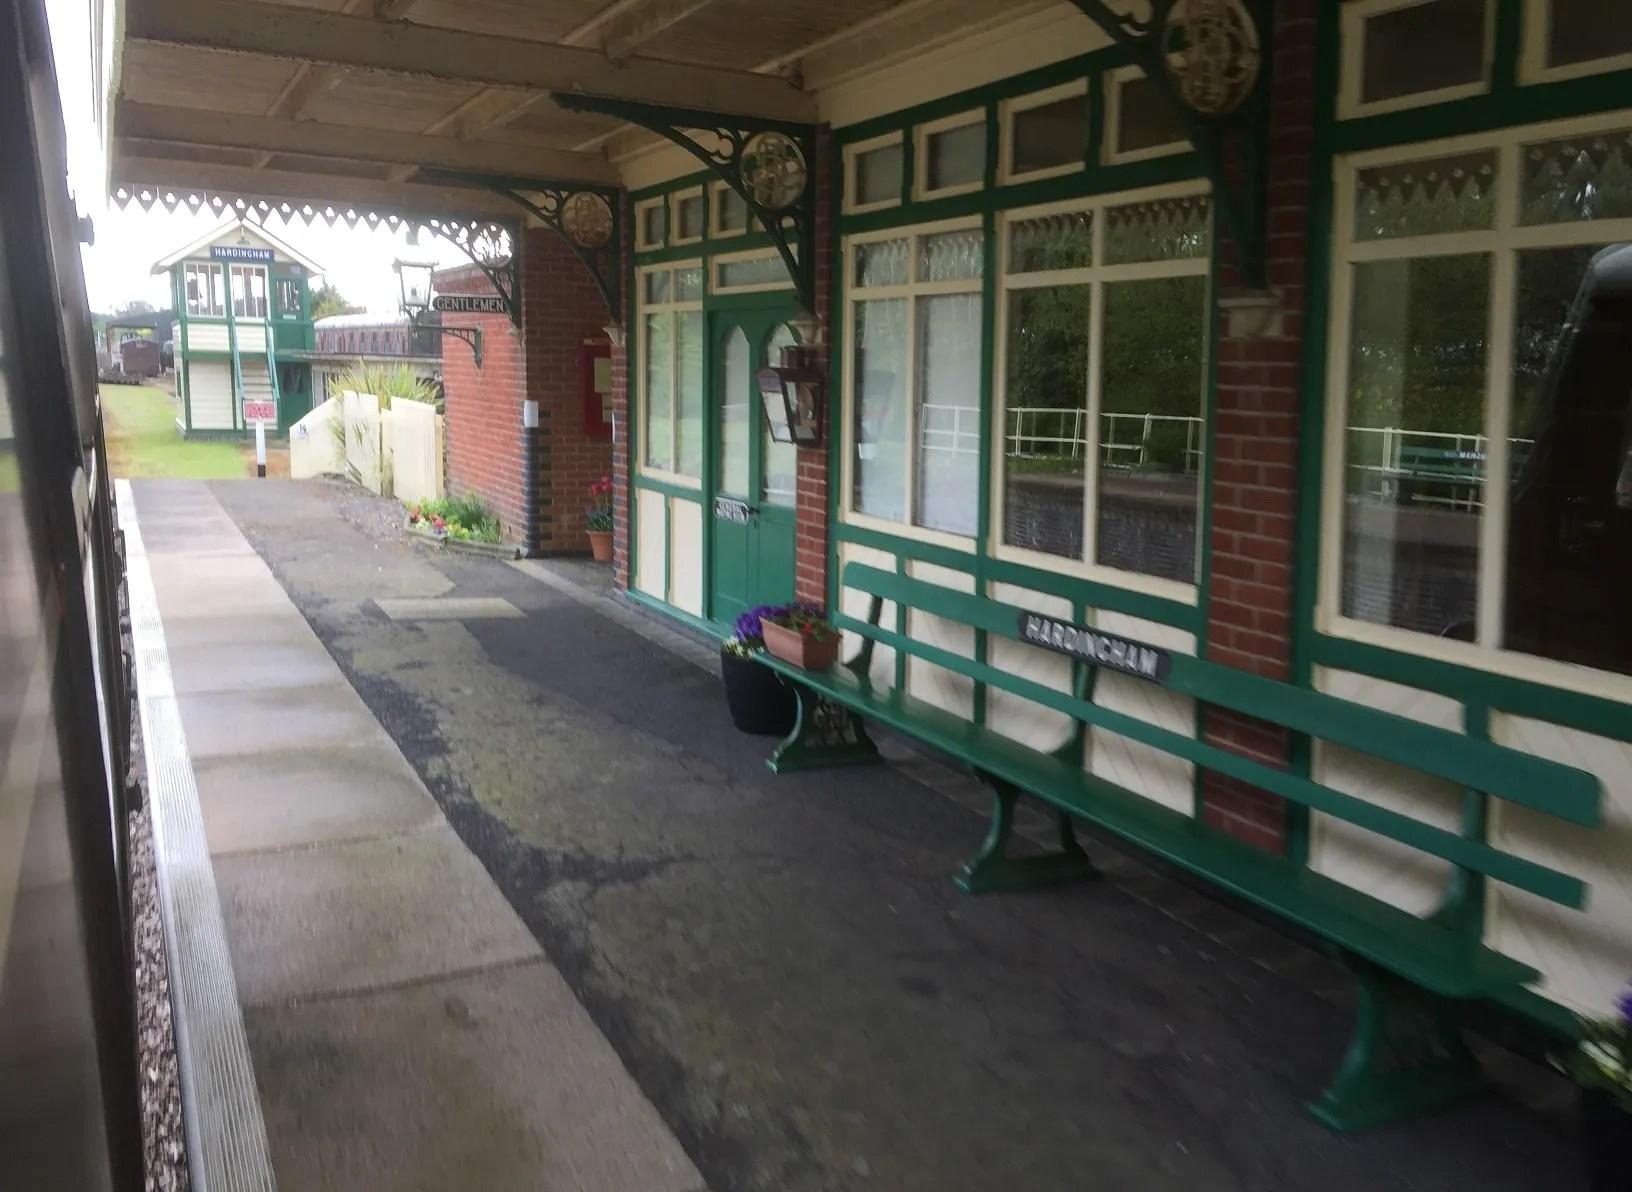 The privately owned Hardingham Station